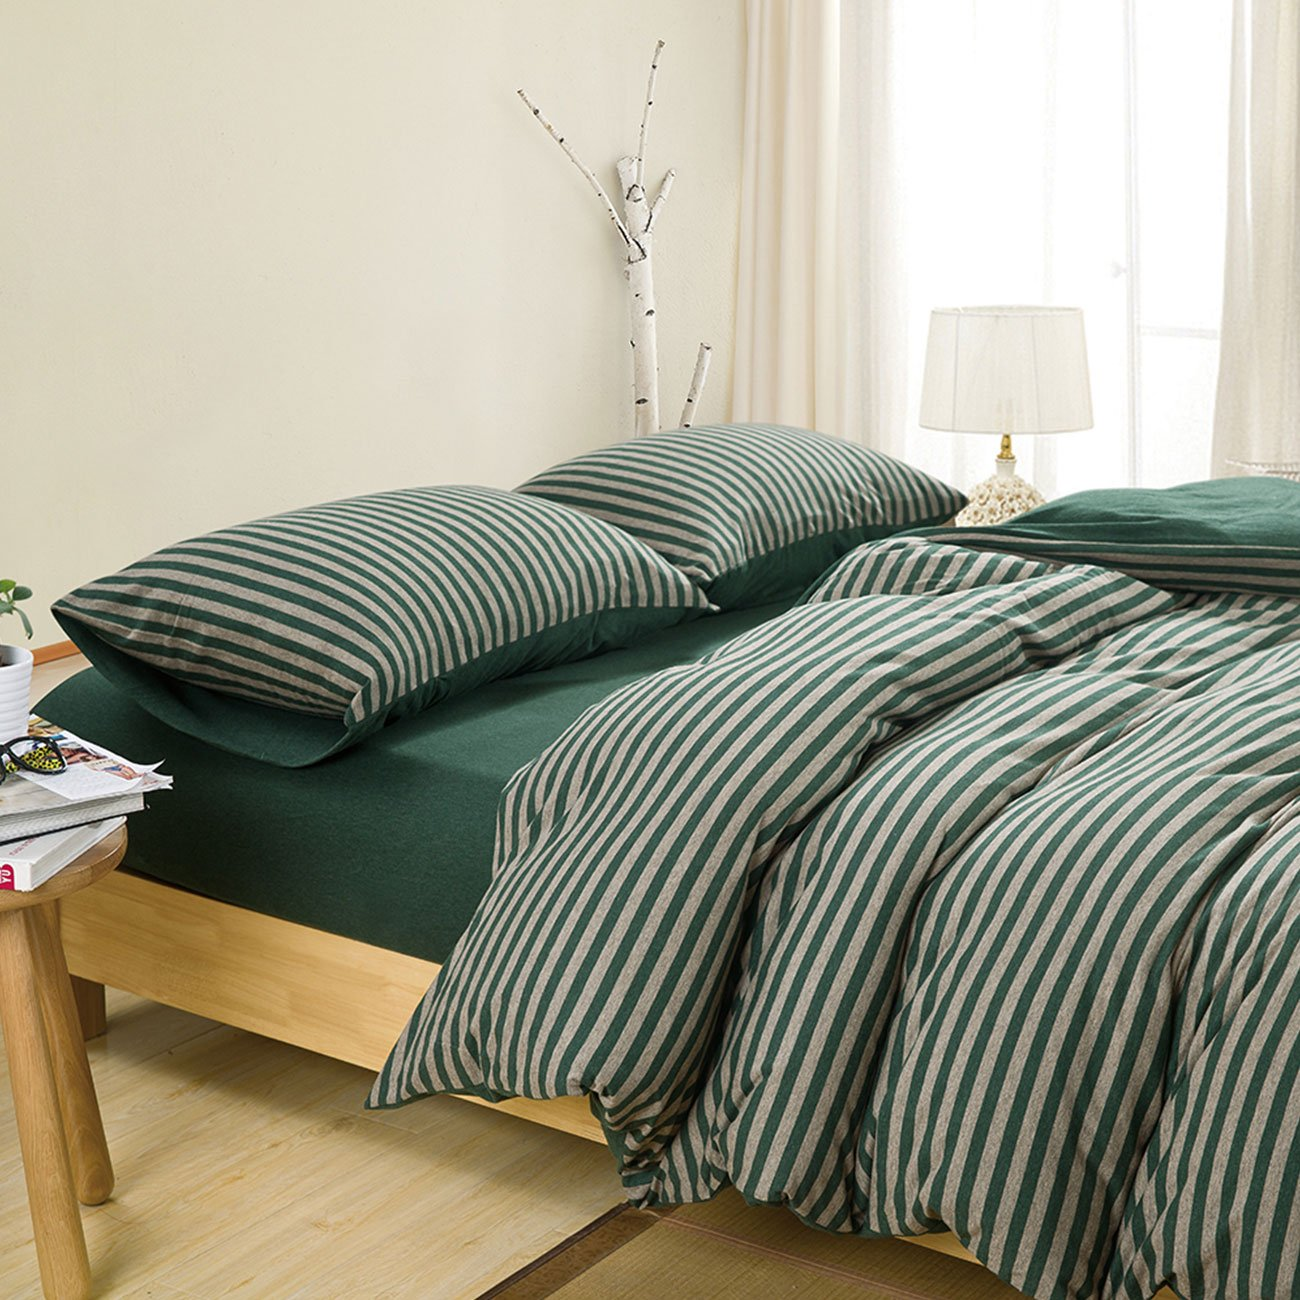 Duvet Cover Set Full Size 4 Pcs Set (1 Duvet Cover, 1 Flat Sheet, 2 Pillowcases) Bedding Set Comfortable Pillow Shams Breathable- Dark Green Stripe COLORSUM KF-LSZ4-1496